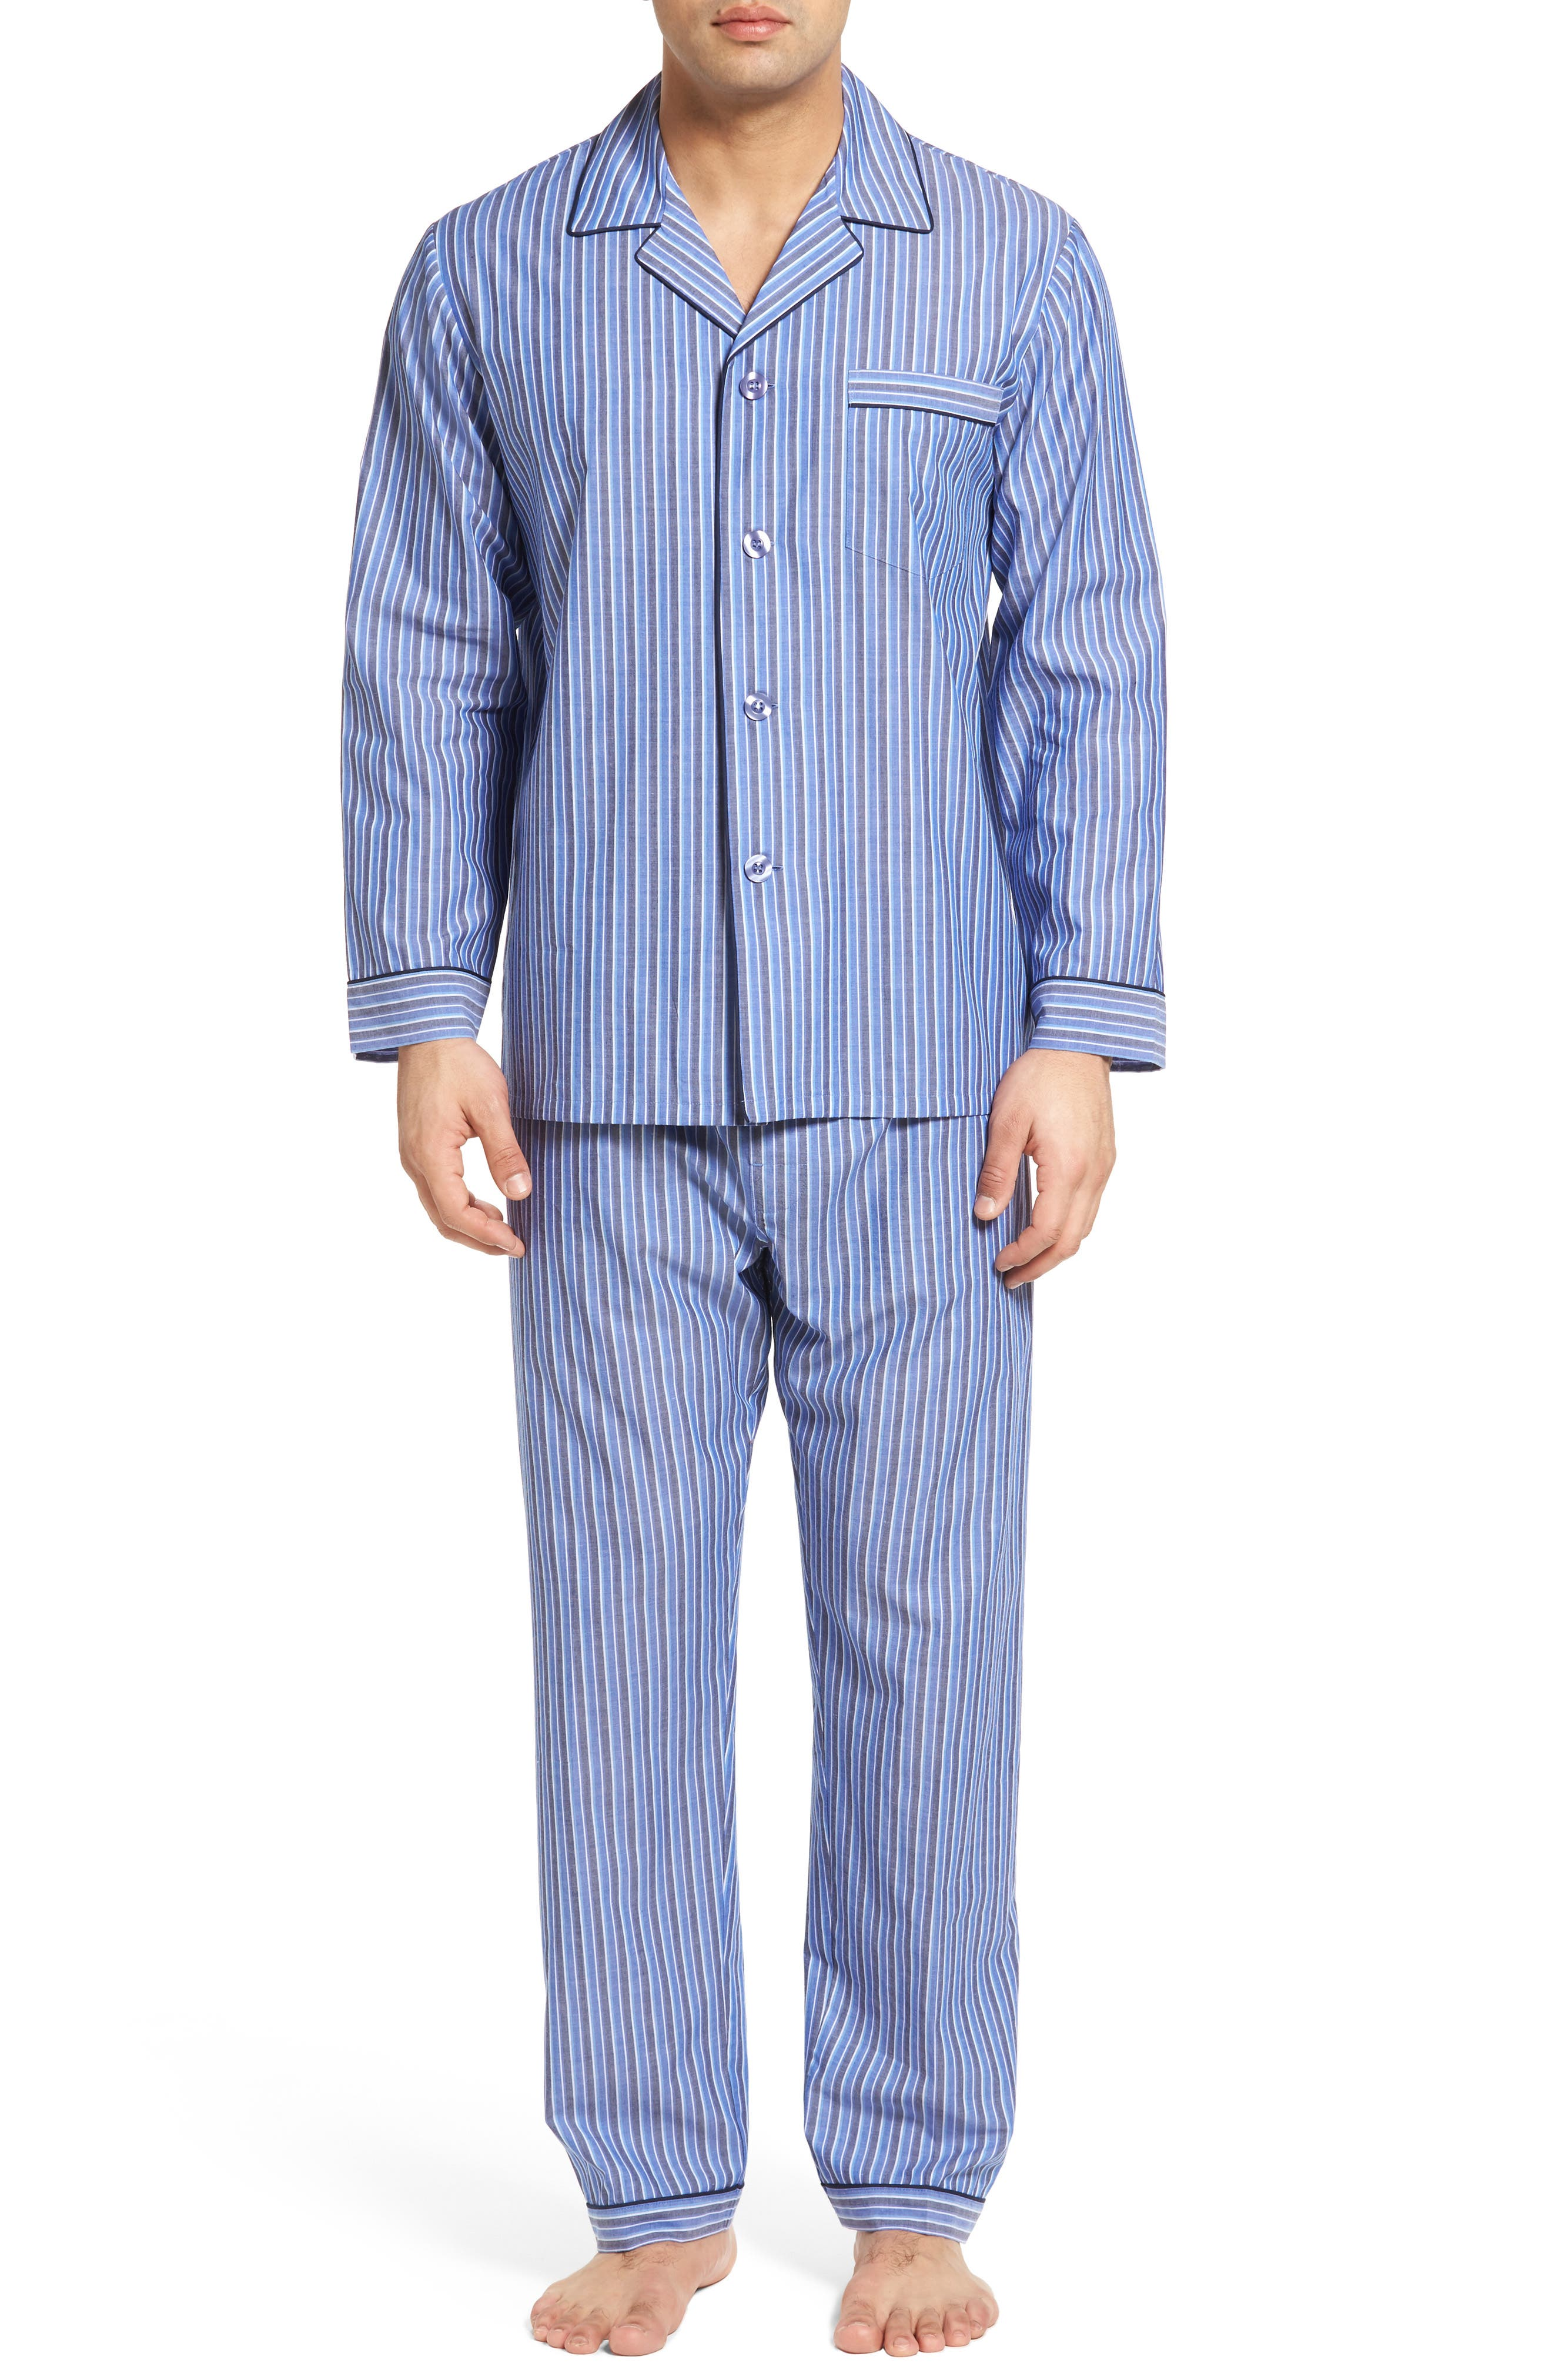 Cole Cotton Blend Pajama Set,                             Main thumbnail 1, color,                             Royal Stripe